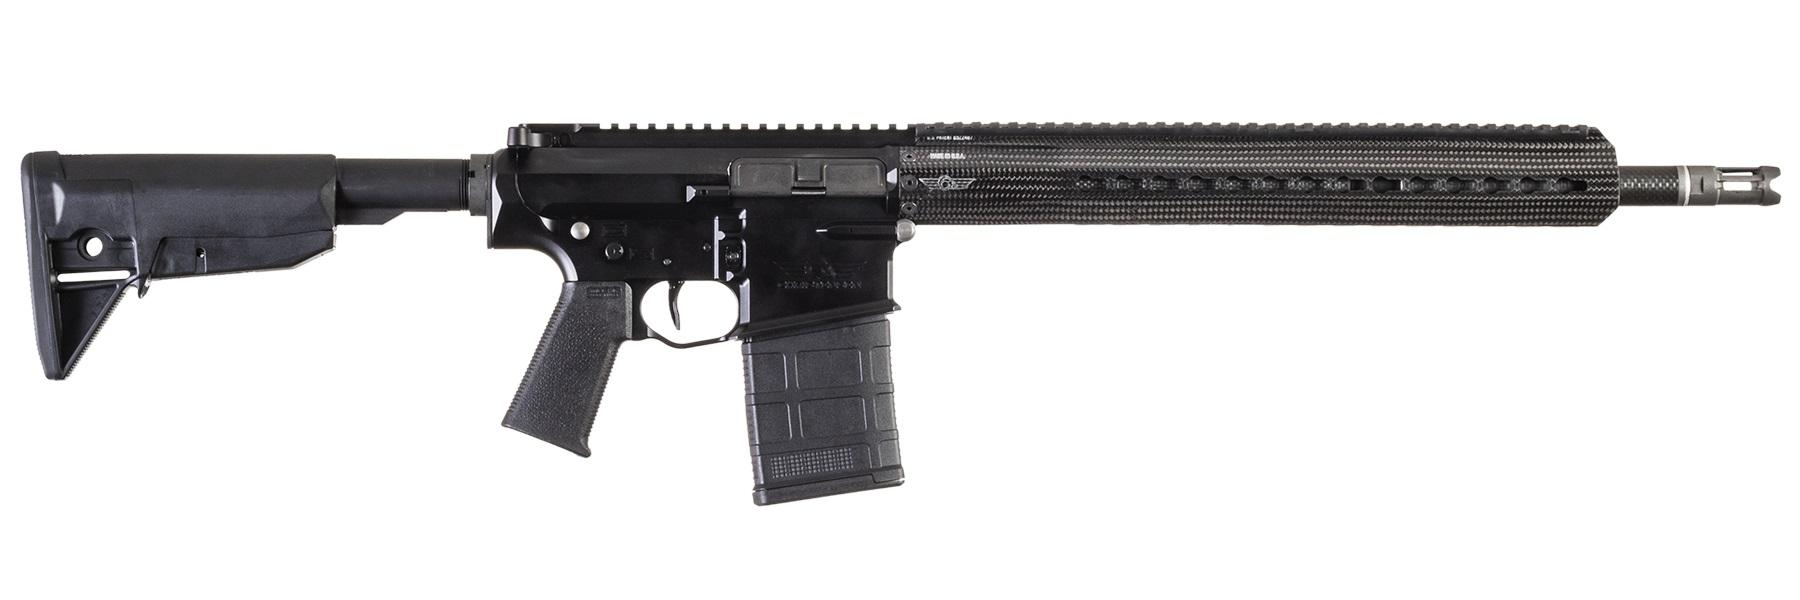 CA-10 G2 CF 308WIN BLK 18 ML - CA11211-1126432